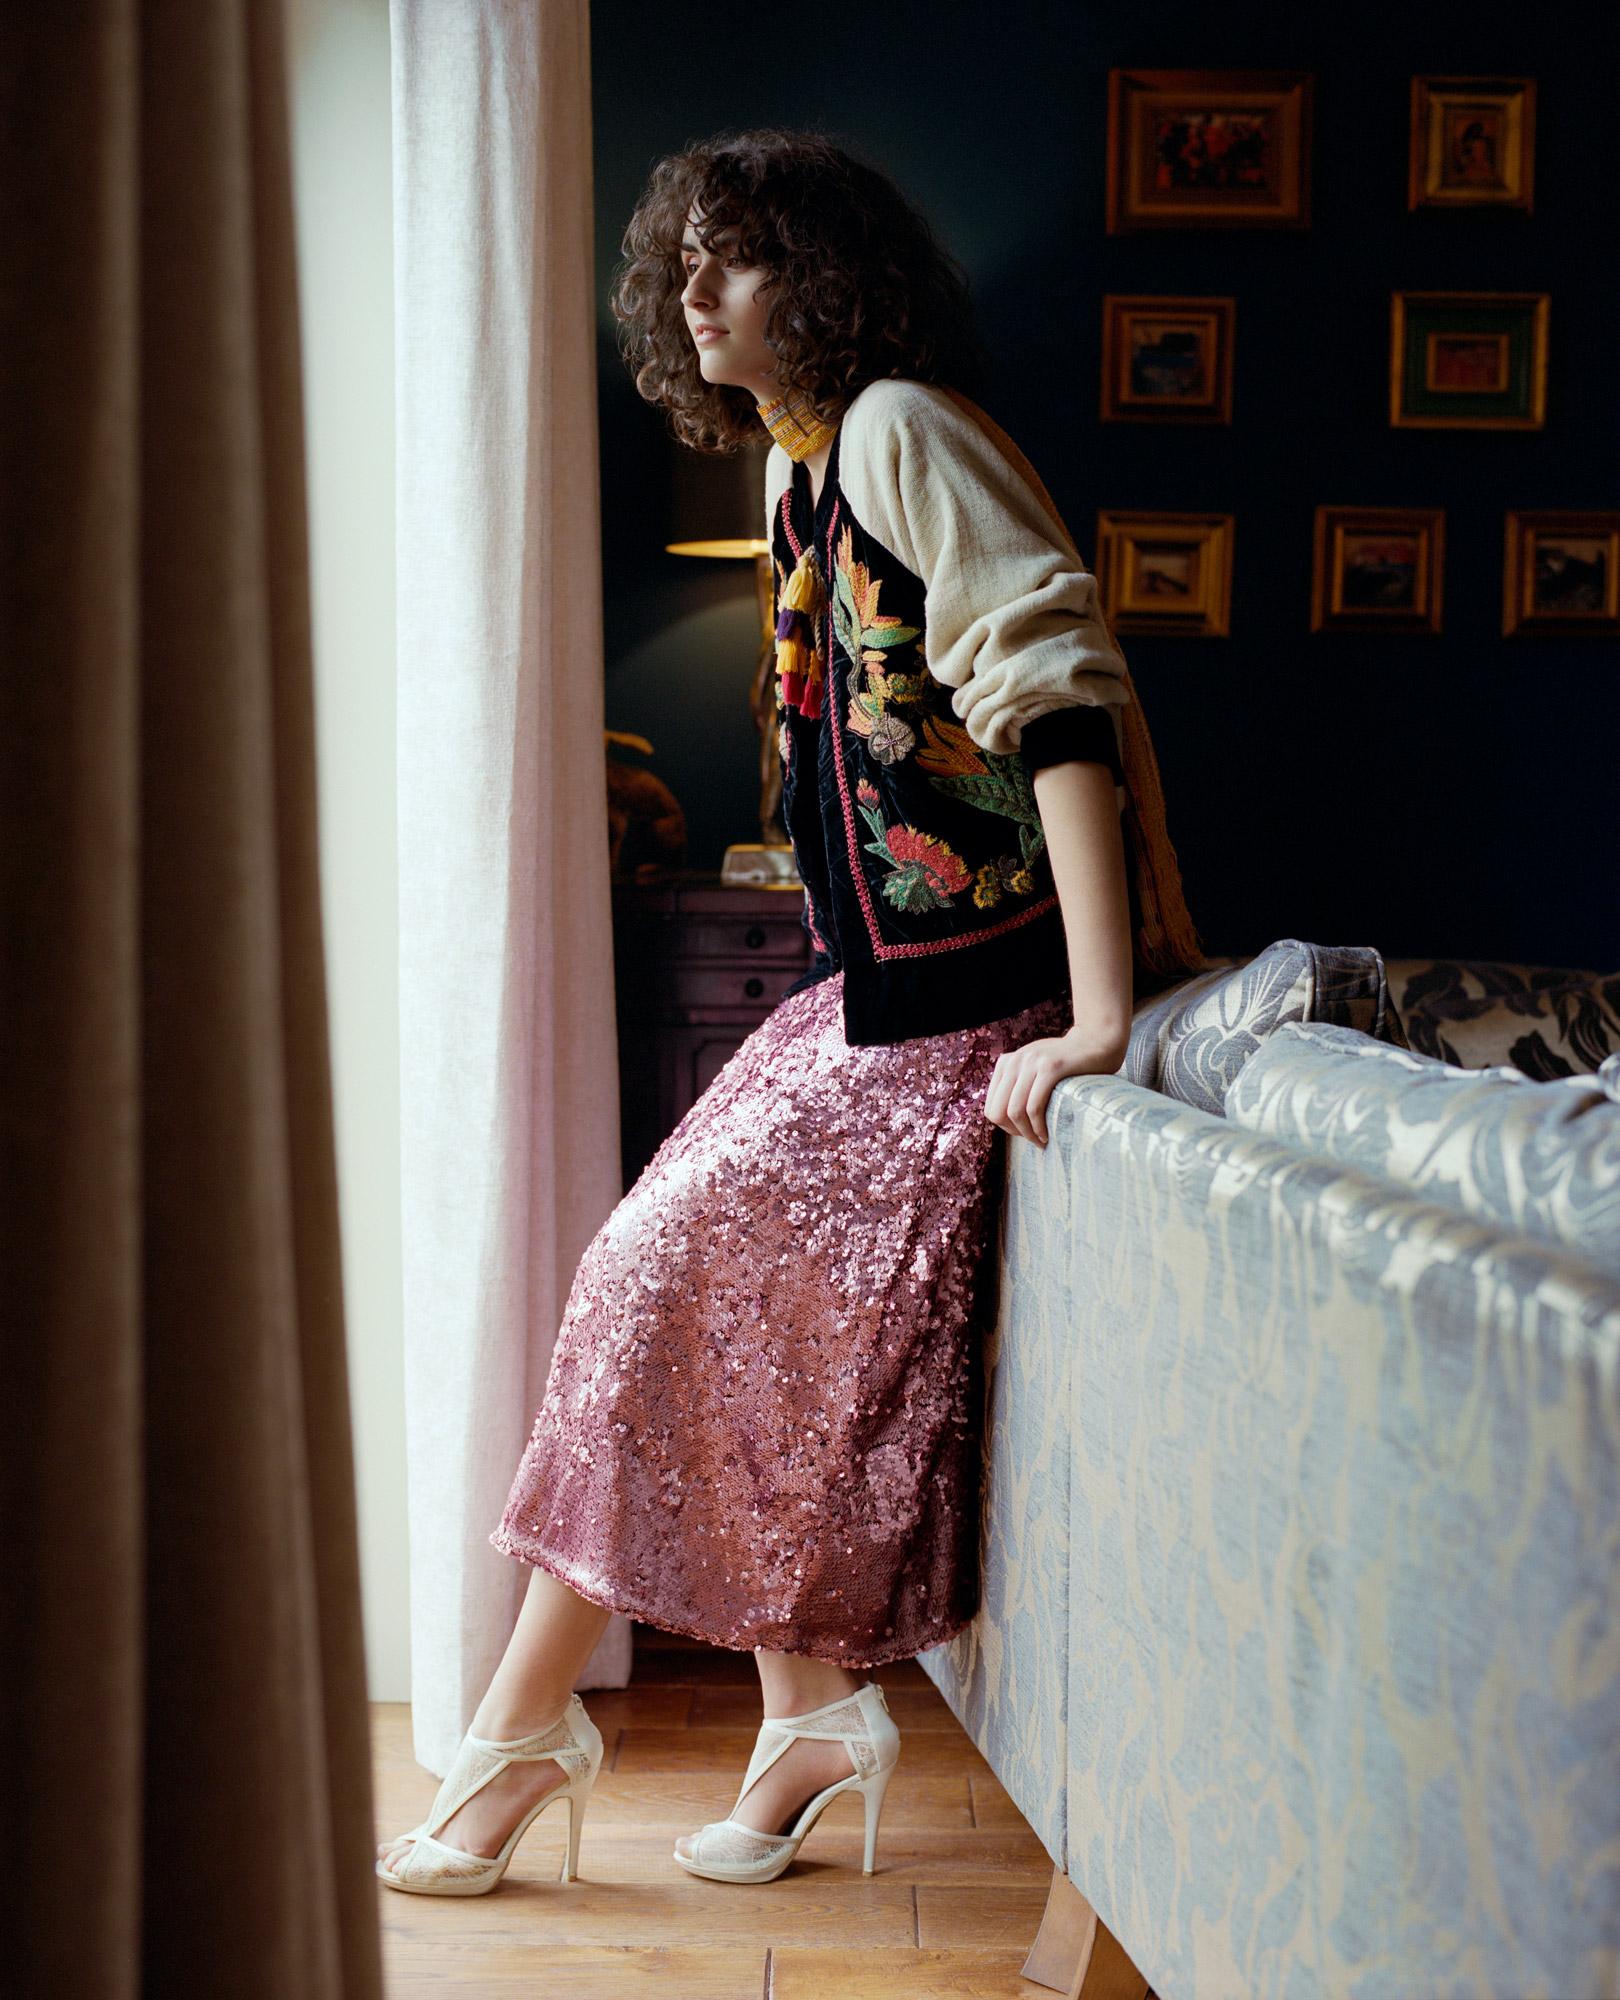 Leila Zandonai in fashion story for Promo Magazine, photography by Ioannis Koussertari